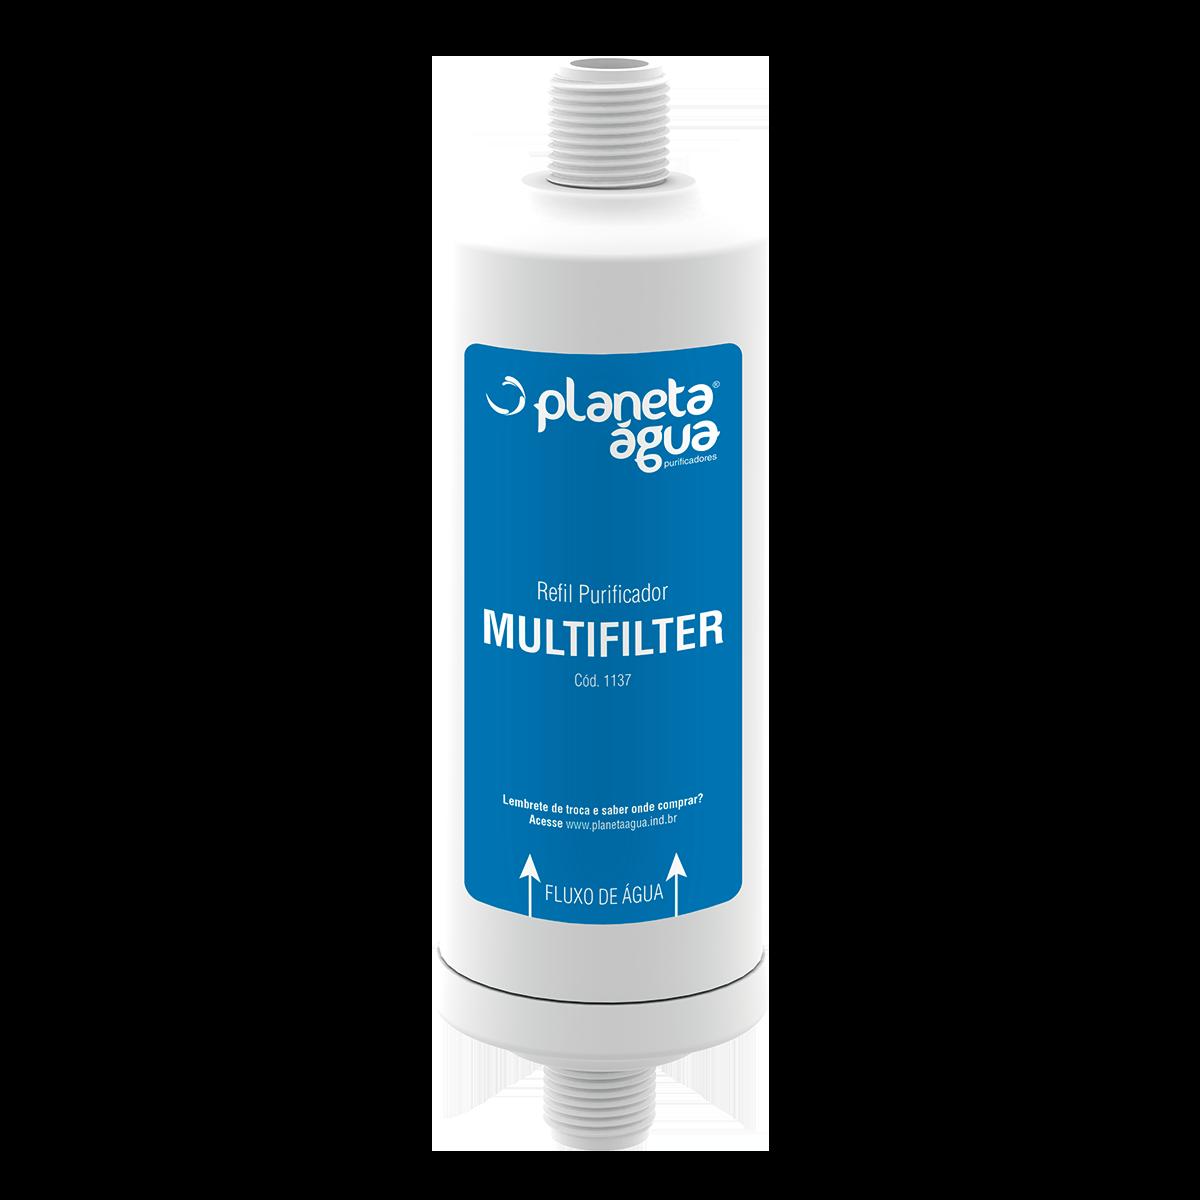 Filtro Multifilter - Refil  - My Shop